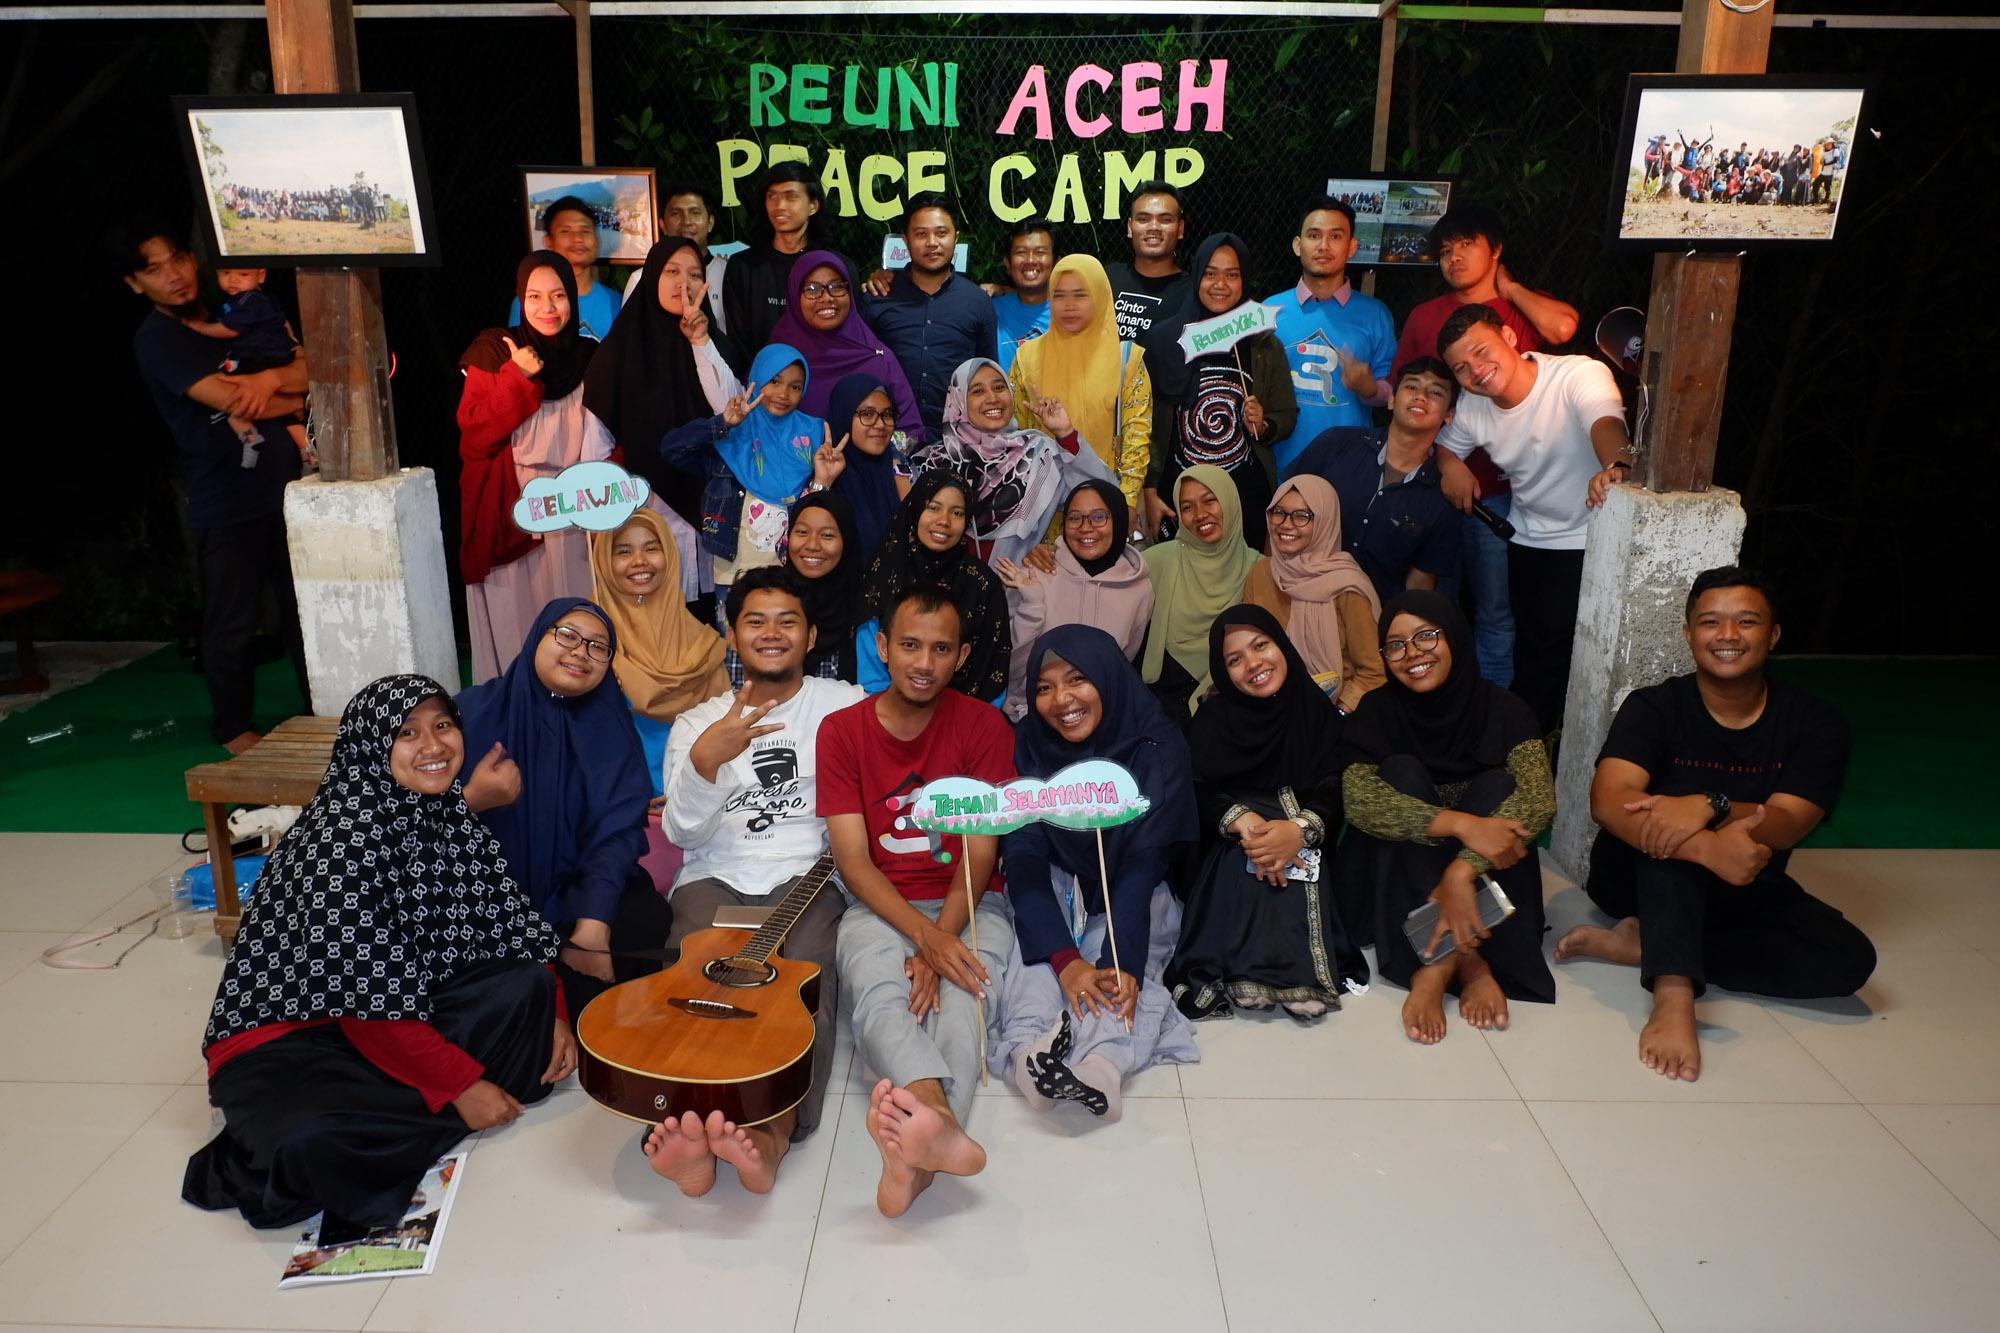 Reuni Aceh Peace Camp; Tiada Hari ini Tanpa Usaha Masa Lalu